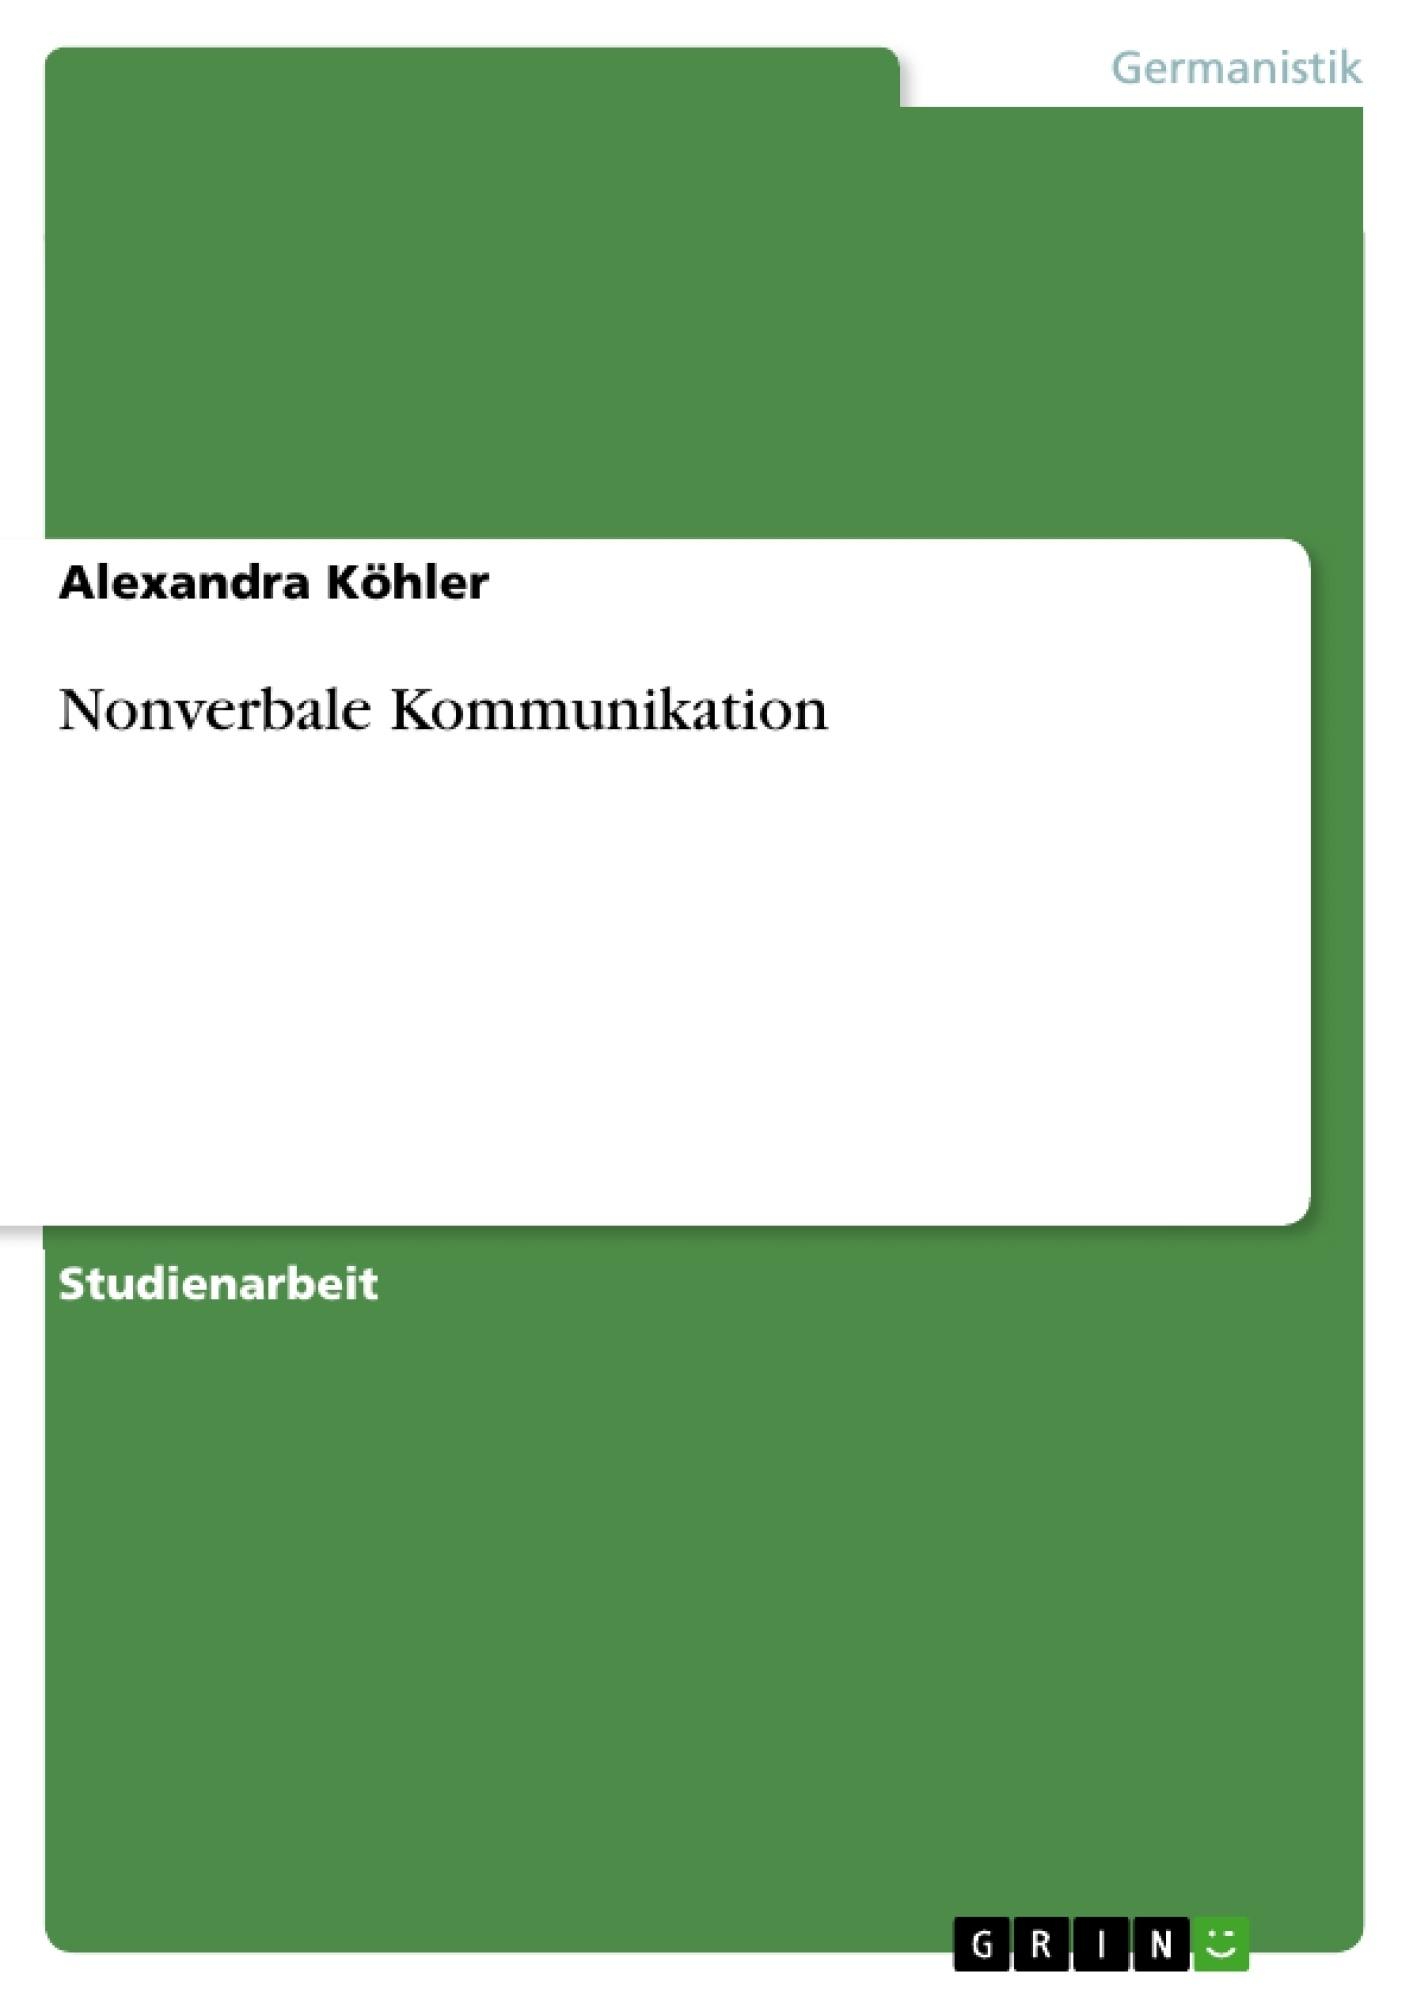 Titel: Nonverbale Kommunikation